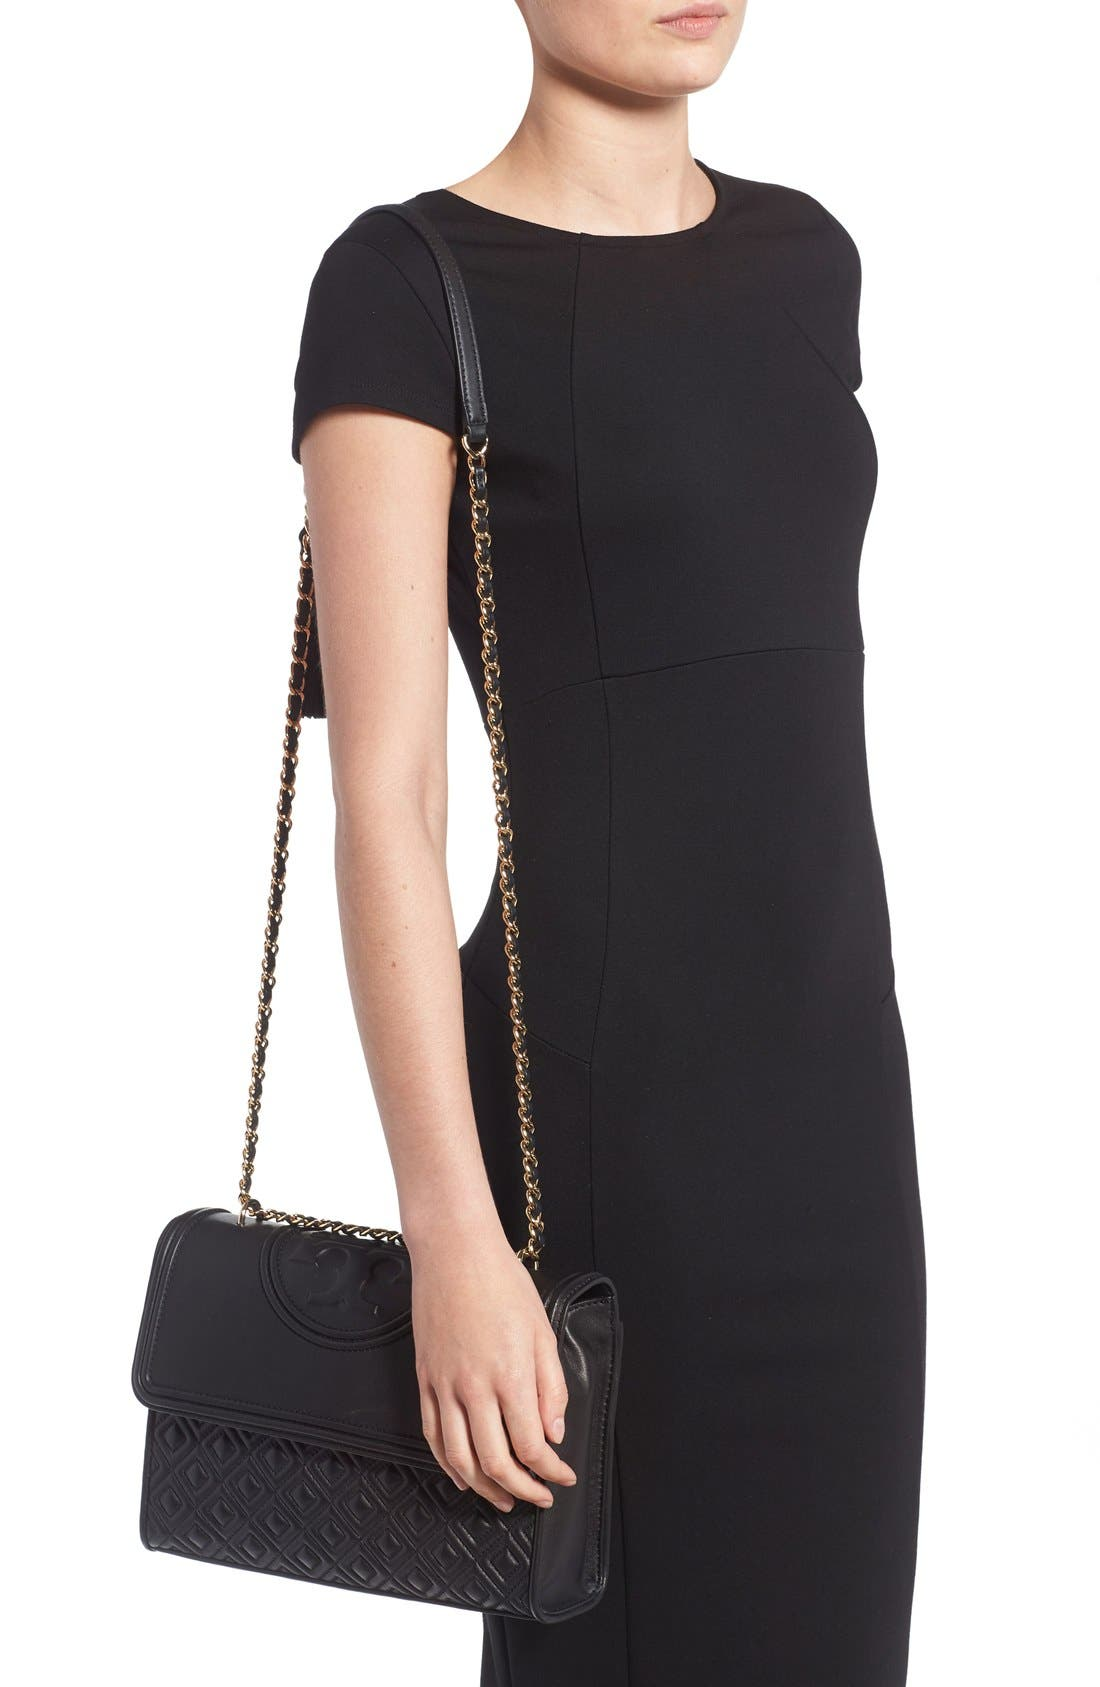 99ce4fd2 Women's Tory Burch Handbags | Nordstrom